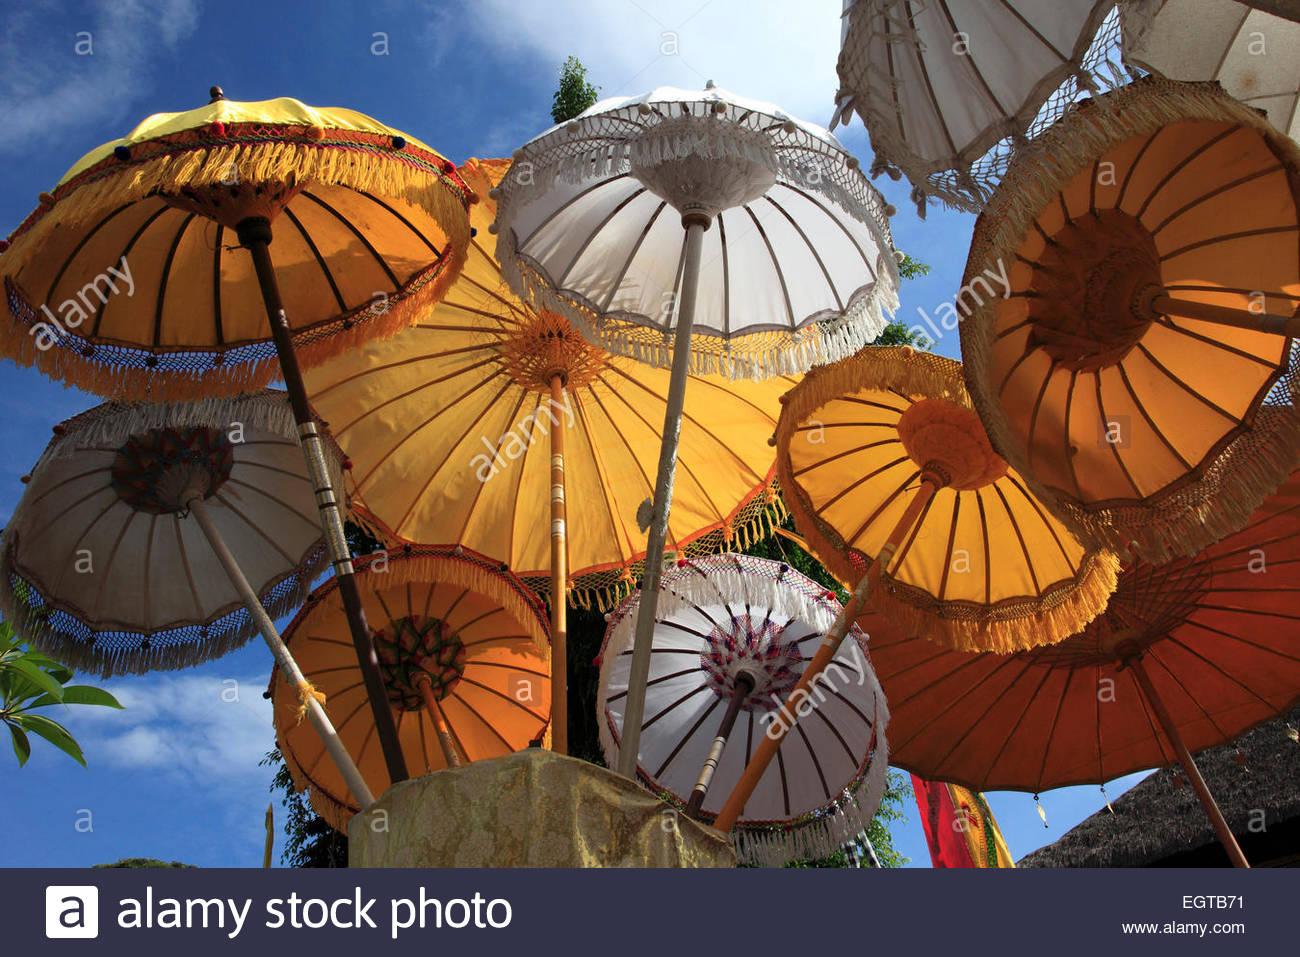 Indonesien, Bali, Mas, Tempelfest, Regenschirme, Odalan, Kuningan Urlaub, Stockbild